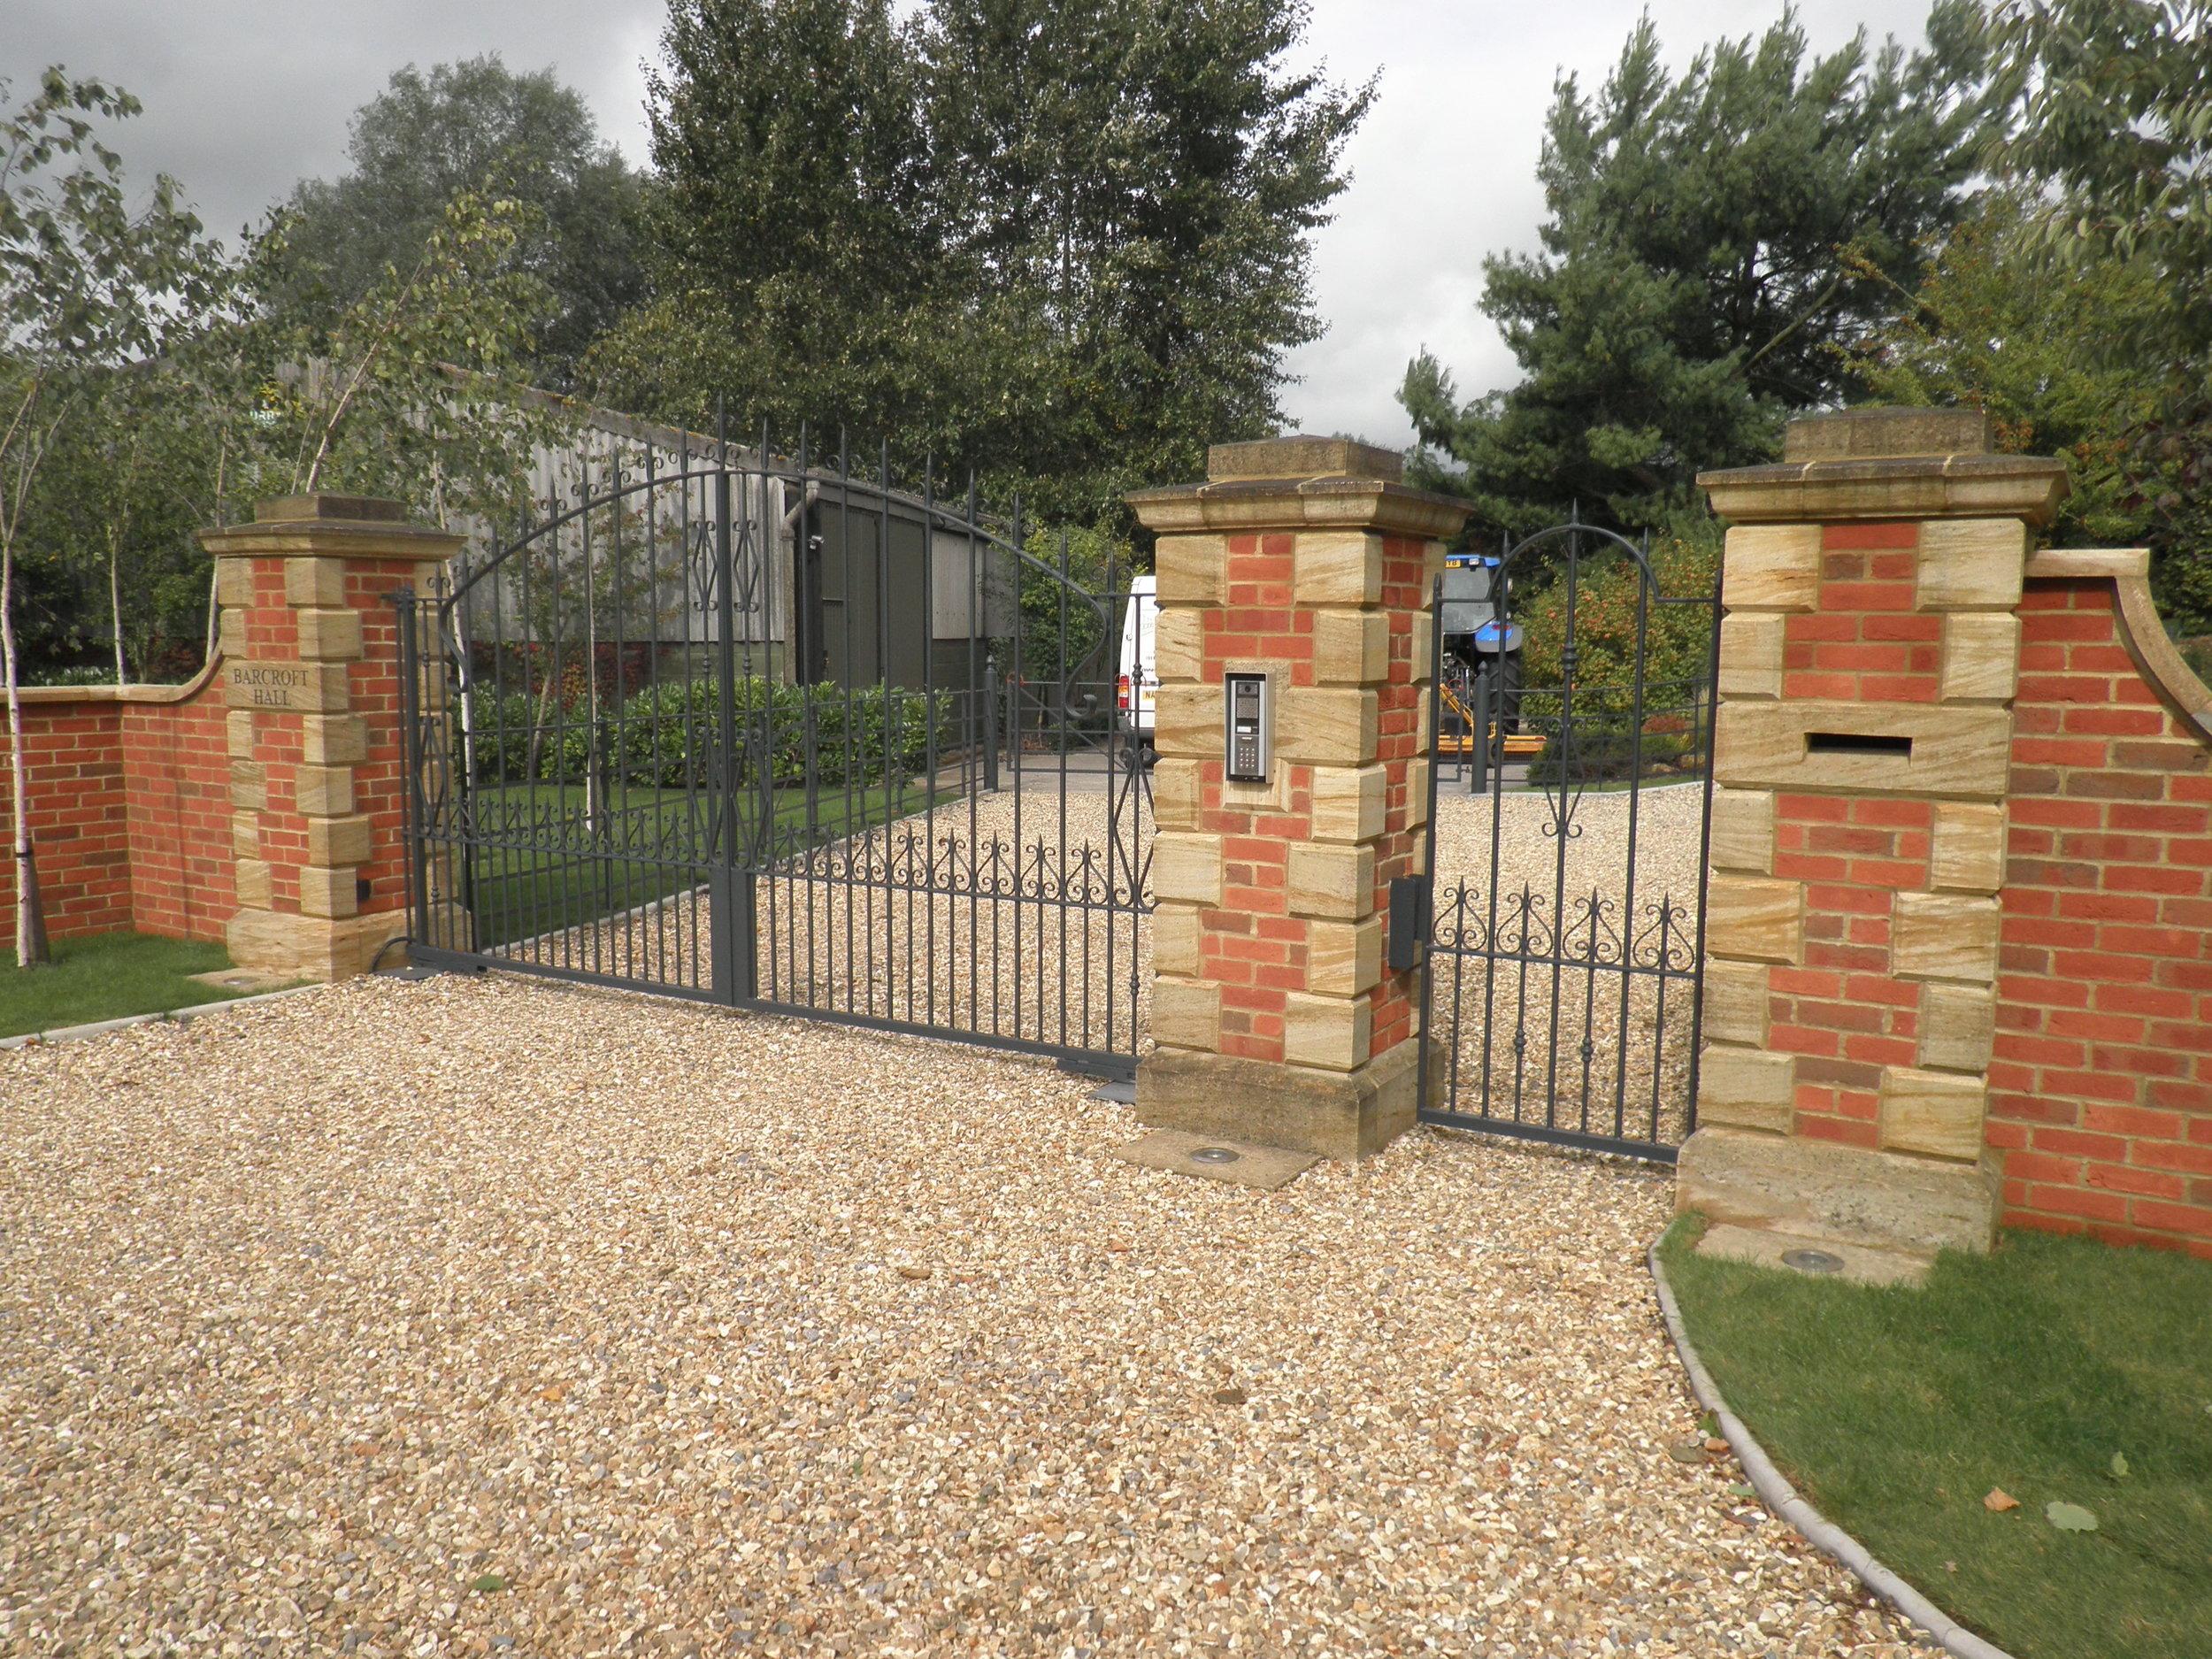 Metal Gates with Pedestrian Access